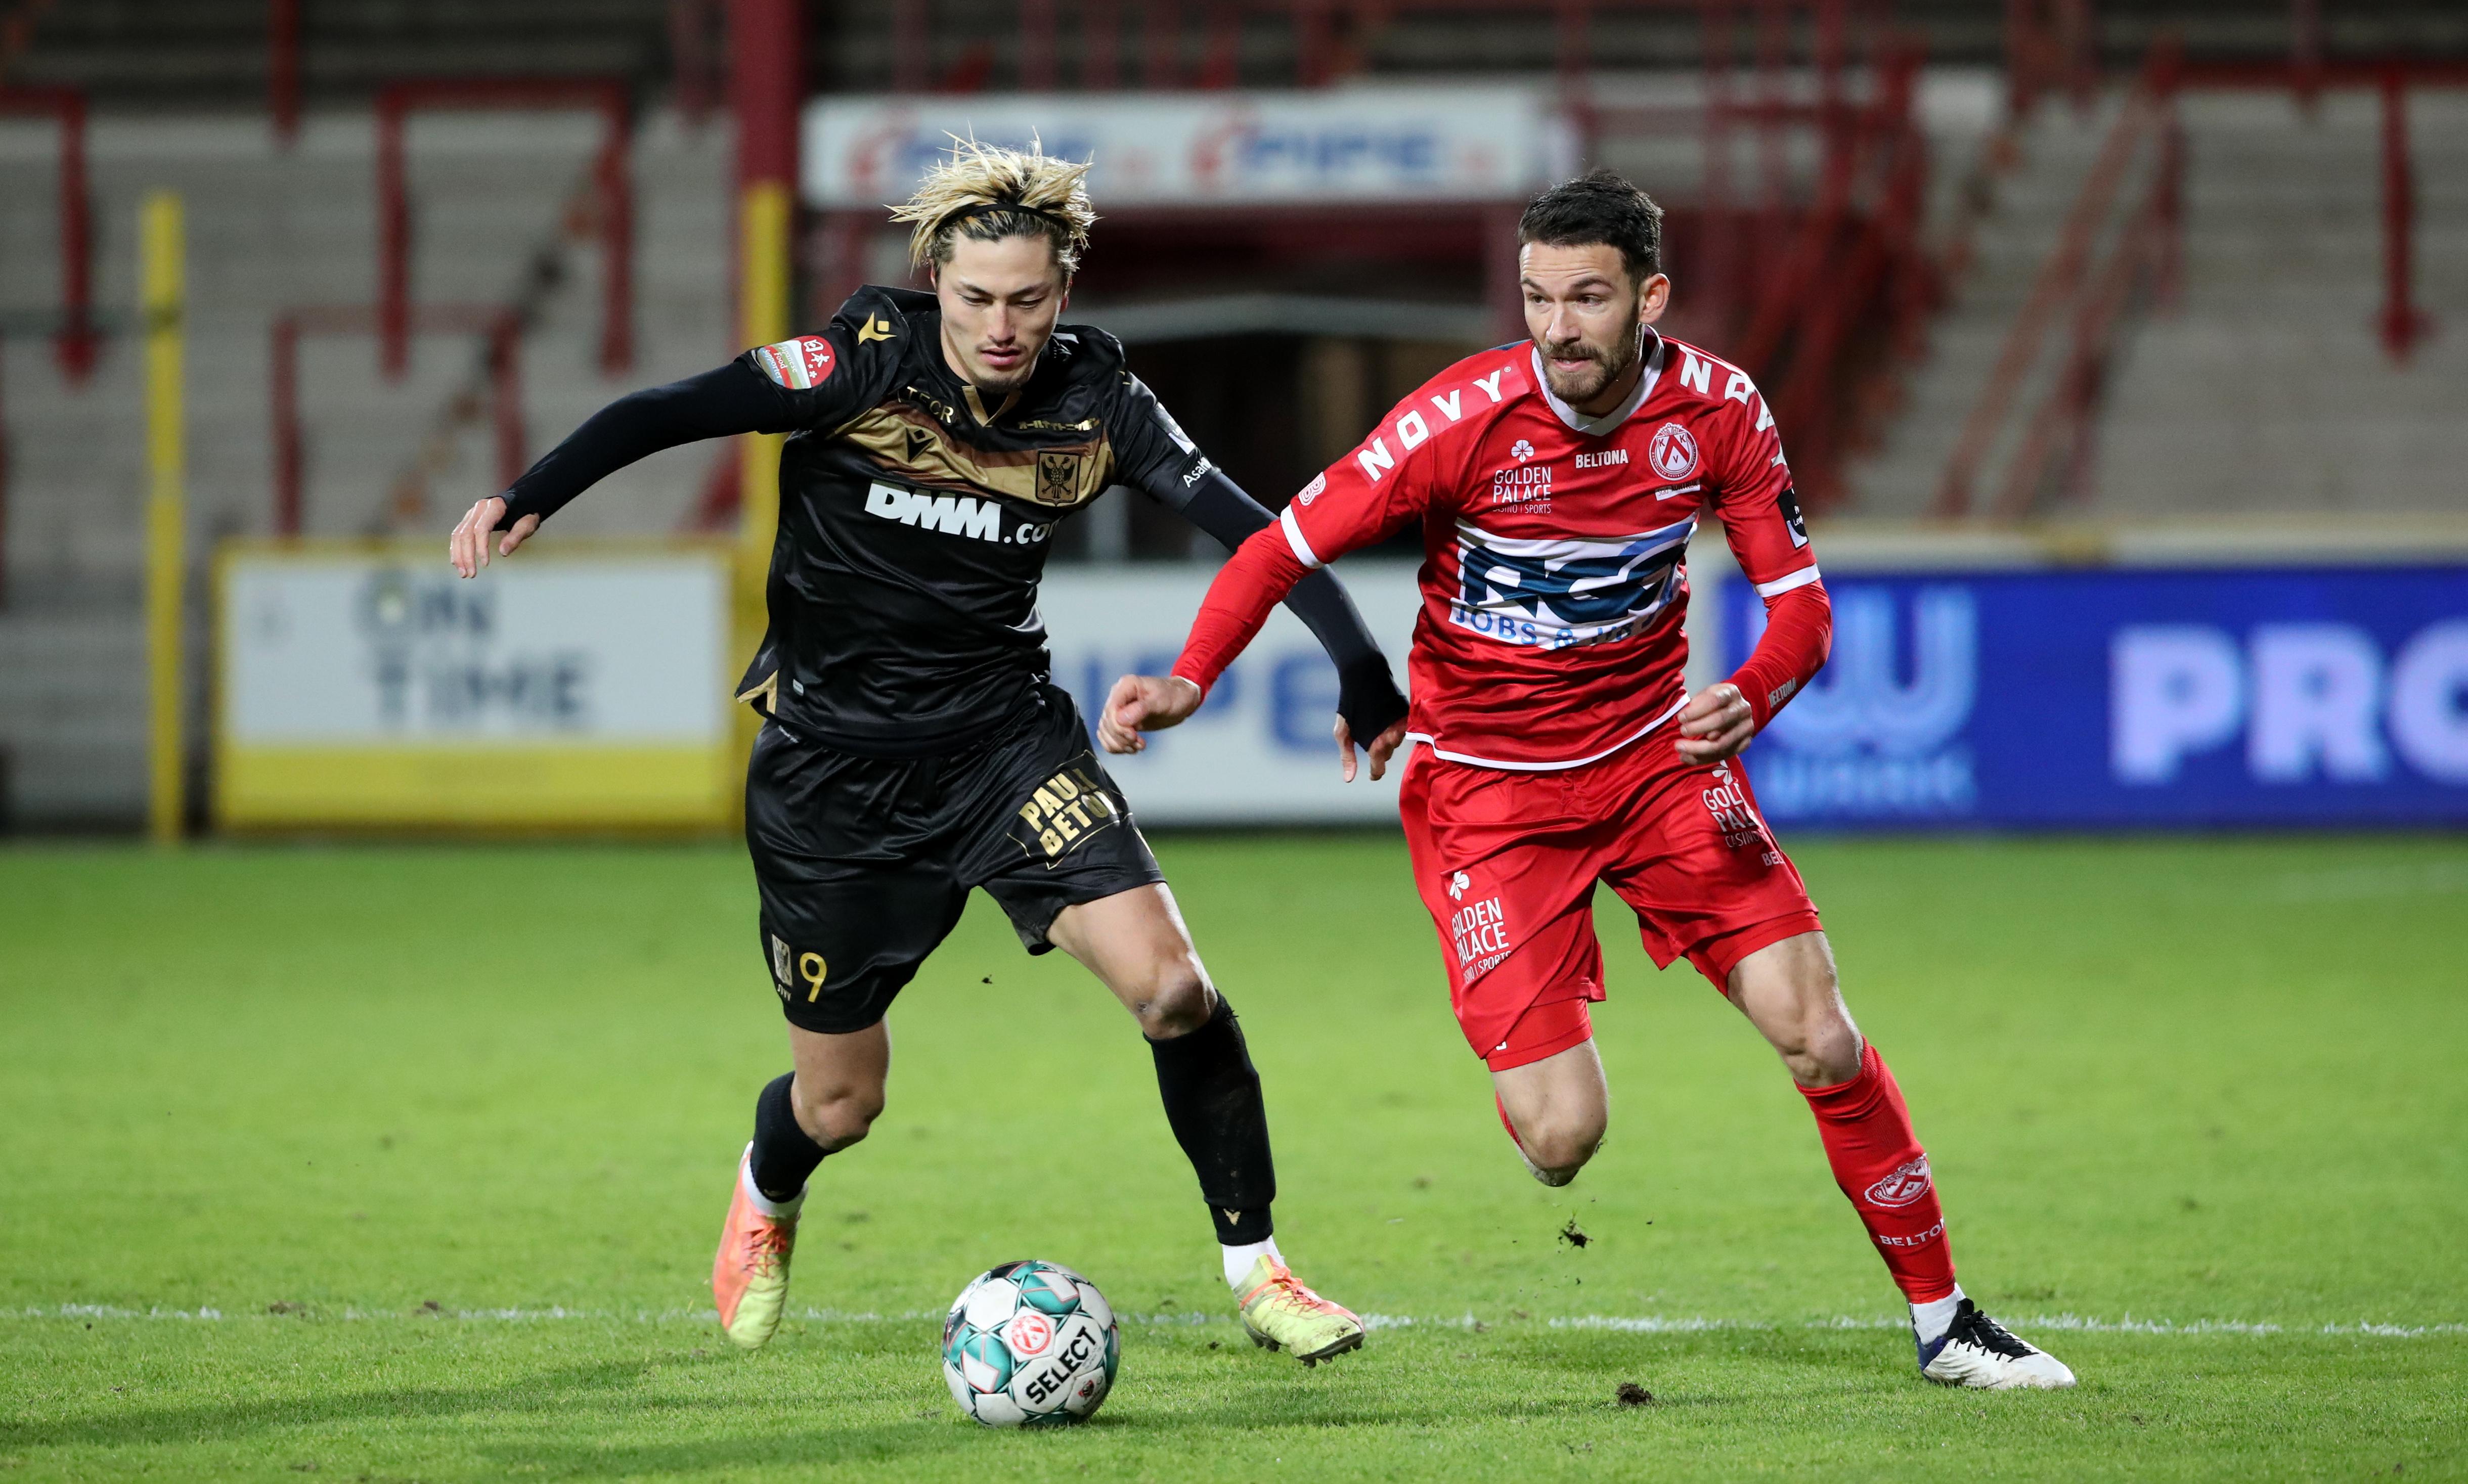 KV Kortrijk v Sint-Truidense VV - Jupiler Pro League